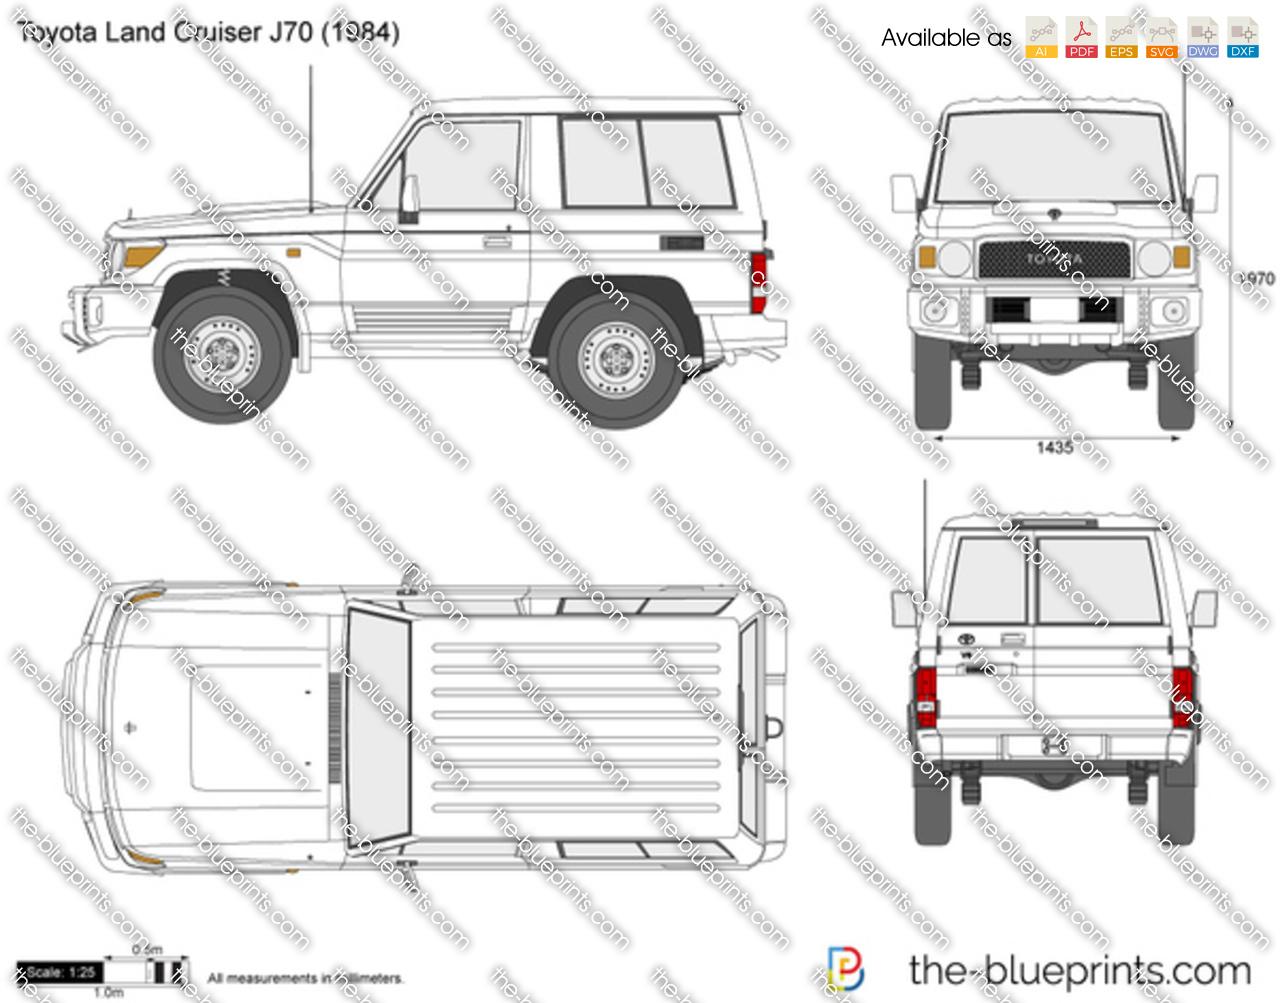 Toyota Land Cruiser J70 SWB